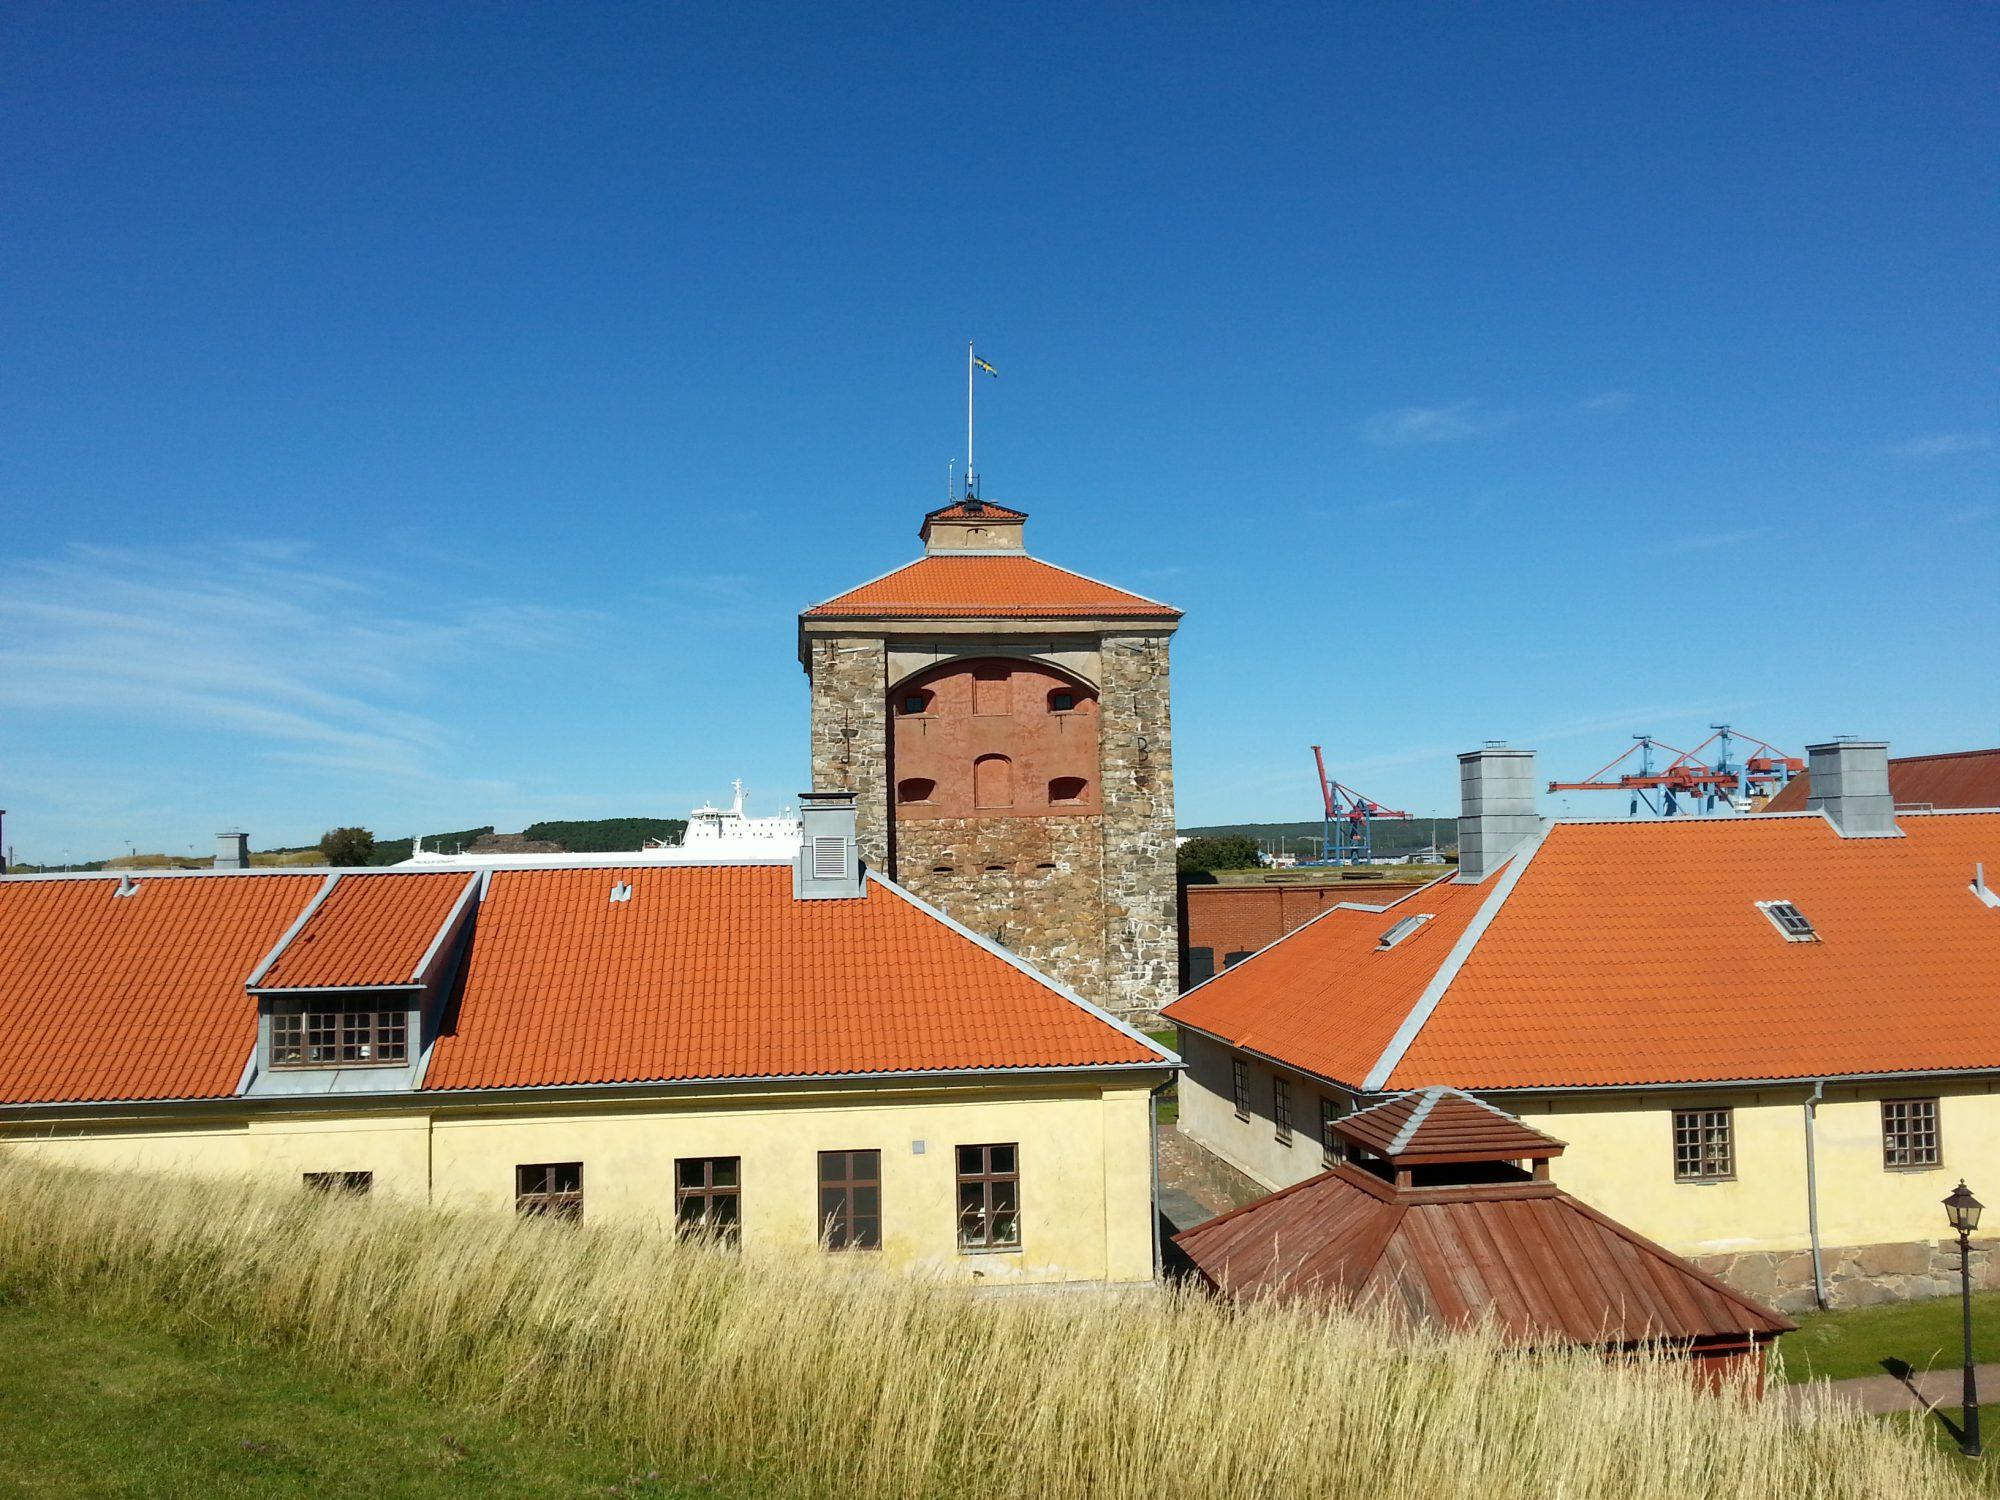 20160815_3_kristina-karlberg_alvsborg